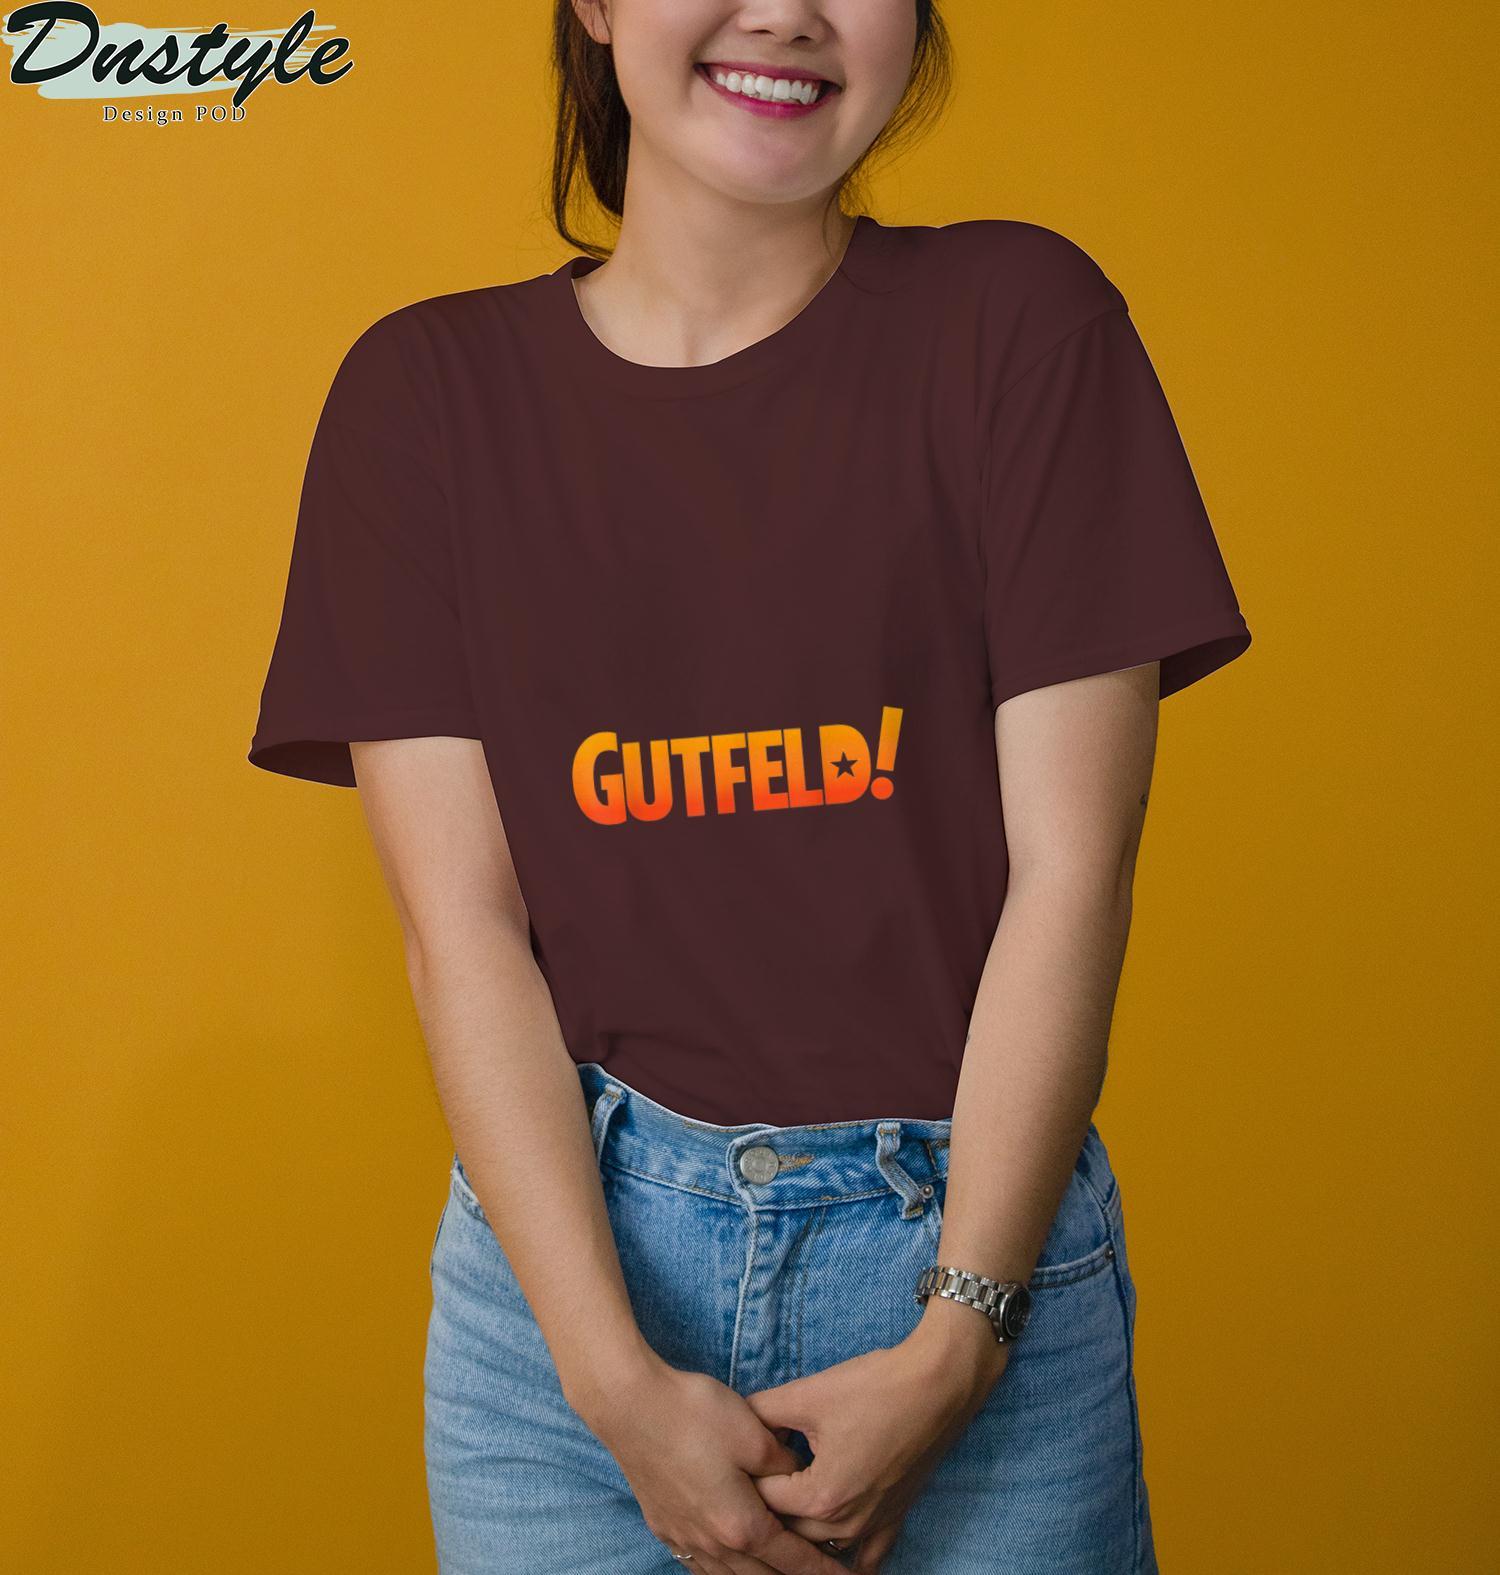 Gutfeld T-Shirt 2